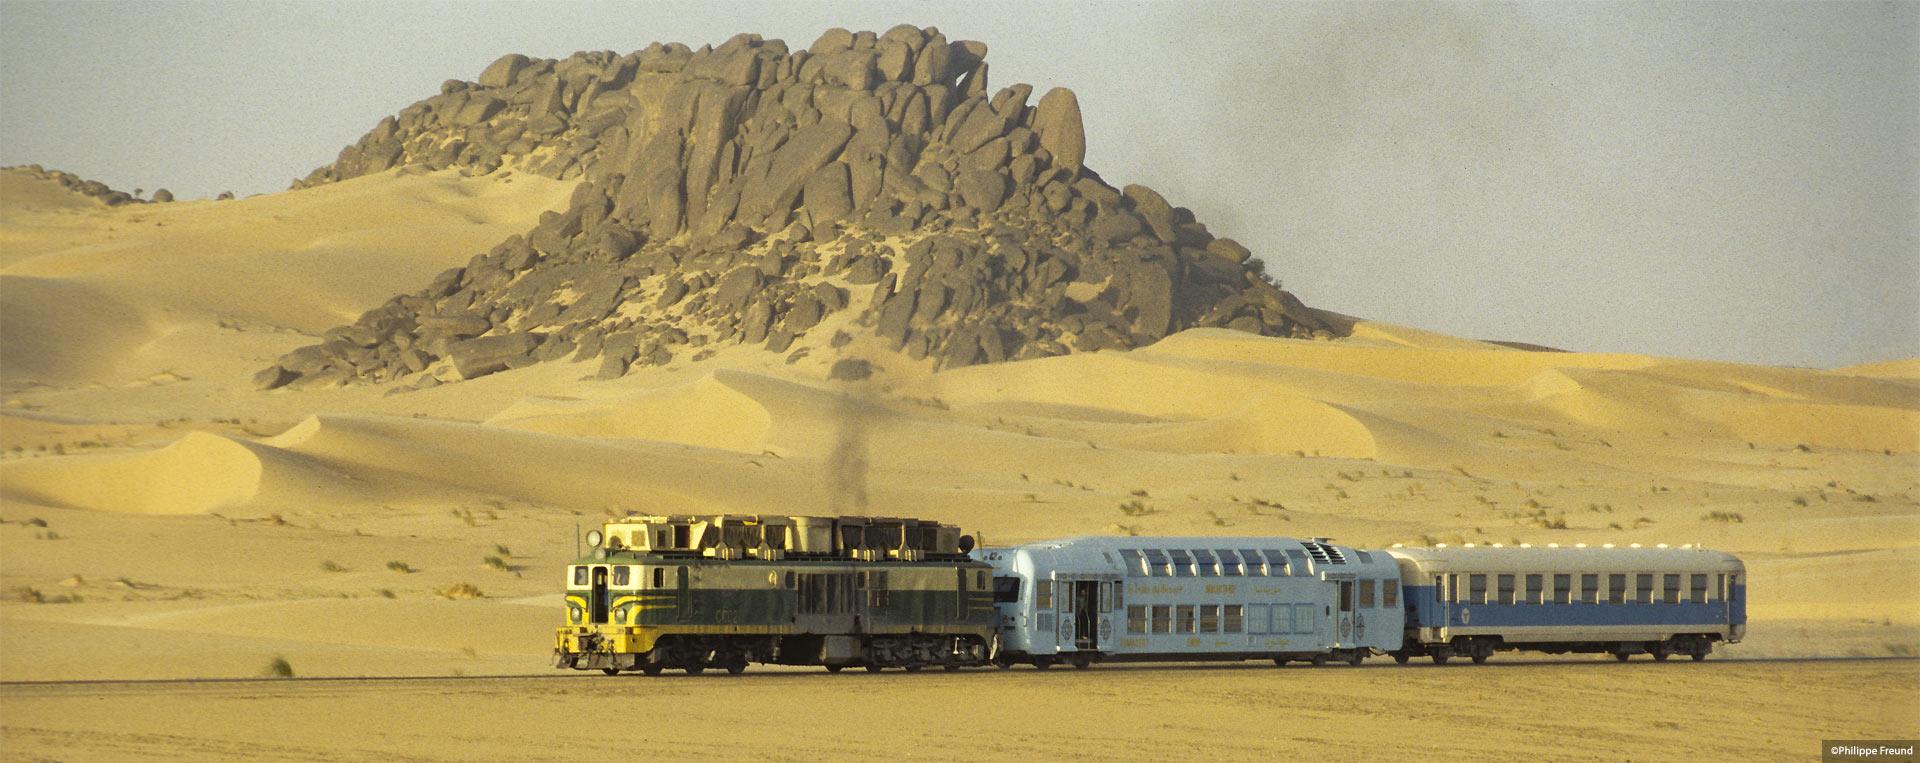 Slider Train du désert en Mauritanie